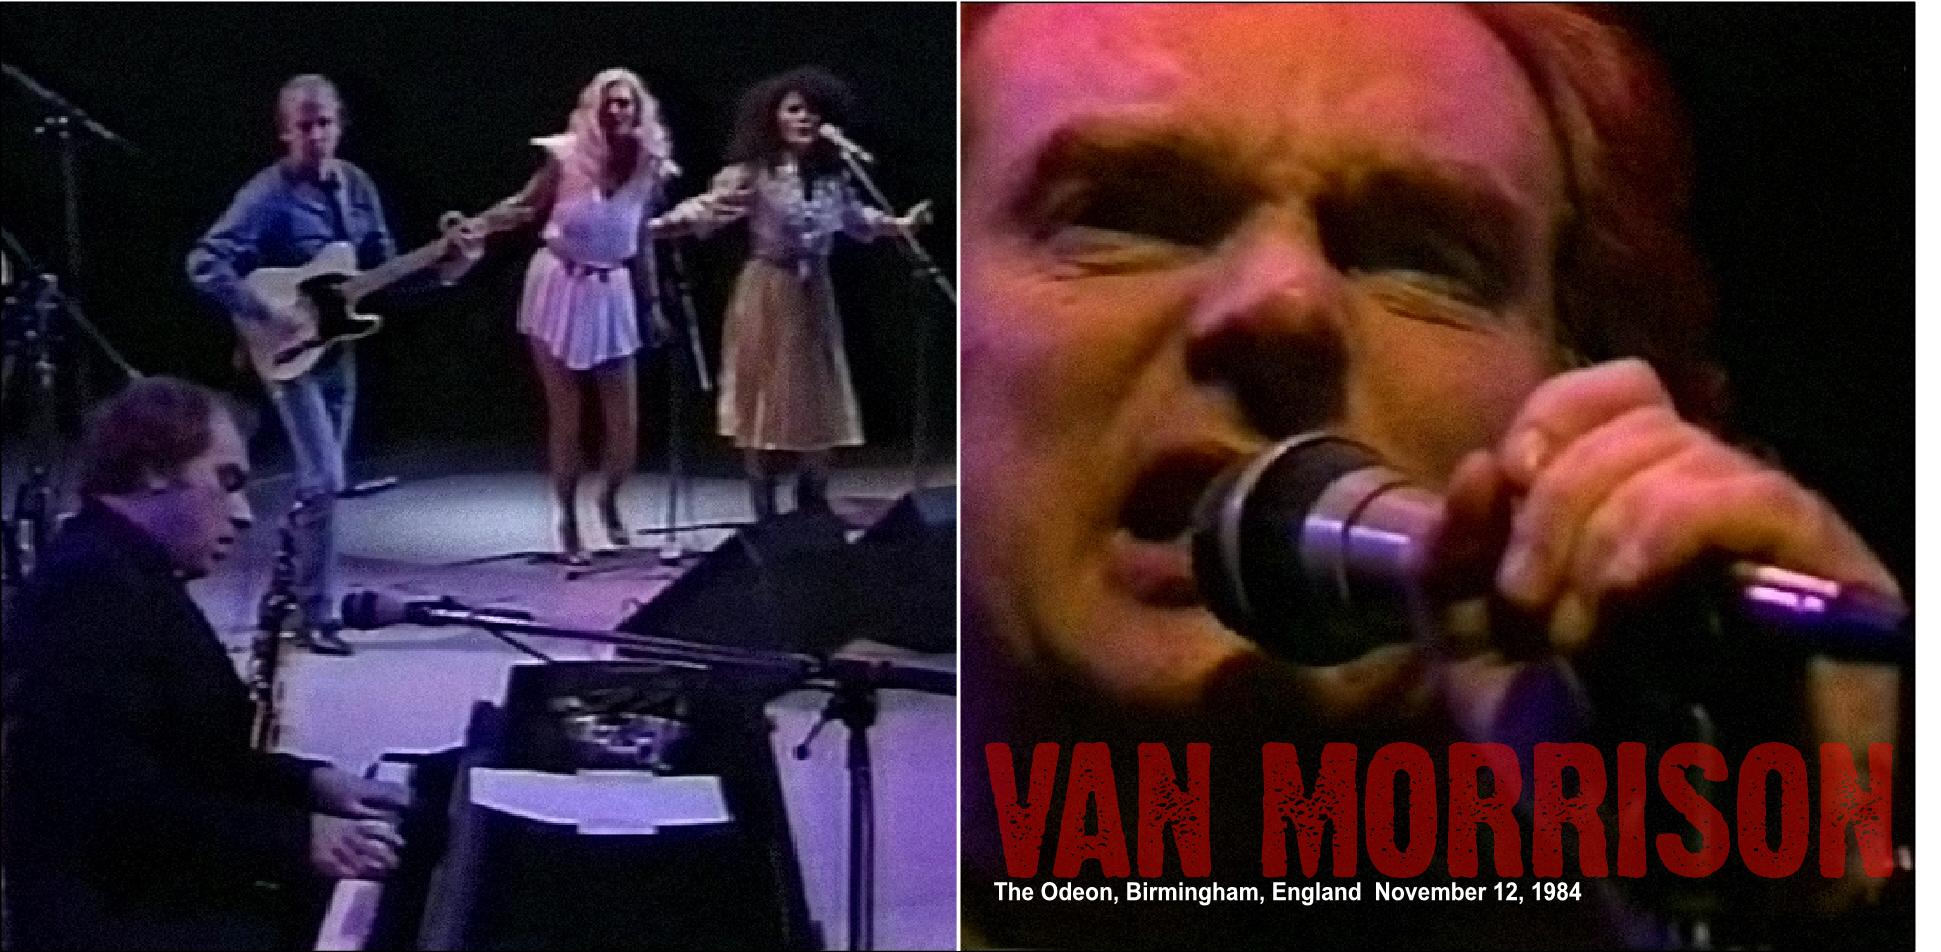 VanMorrison1984-11-12OdeonBirminghamUK.jpg